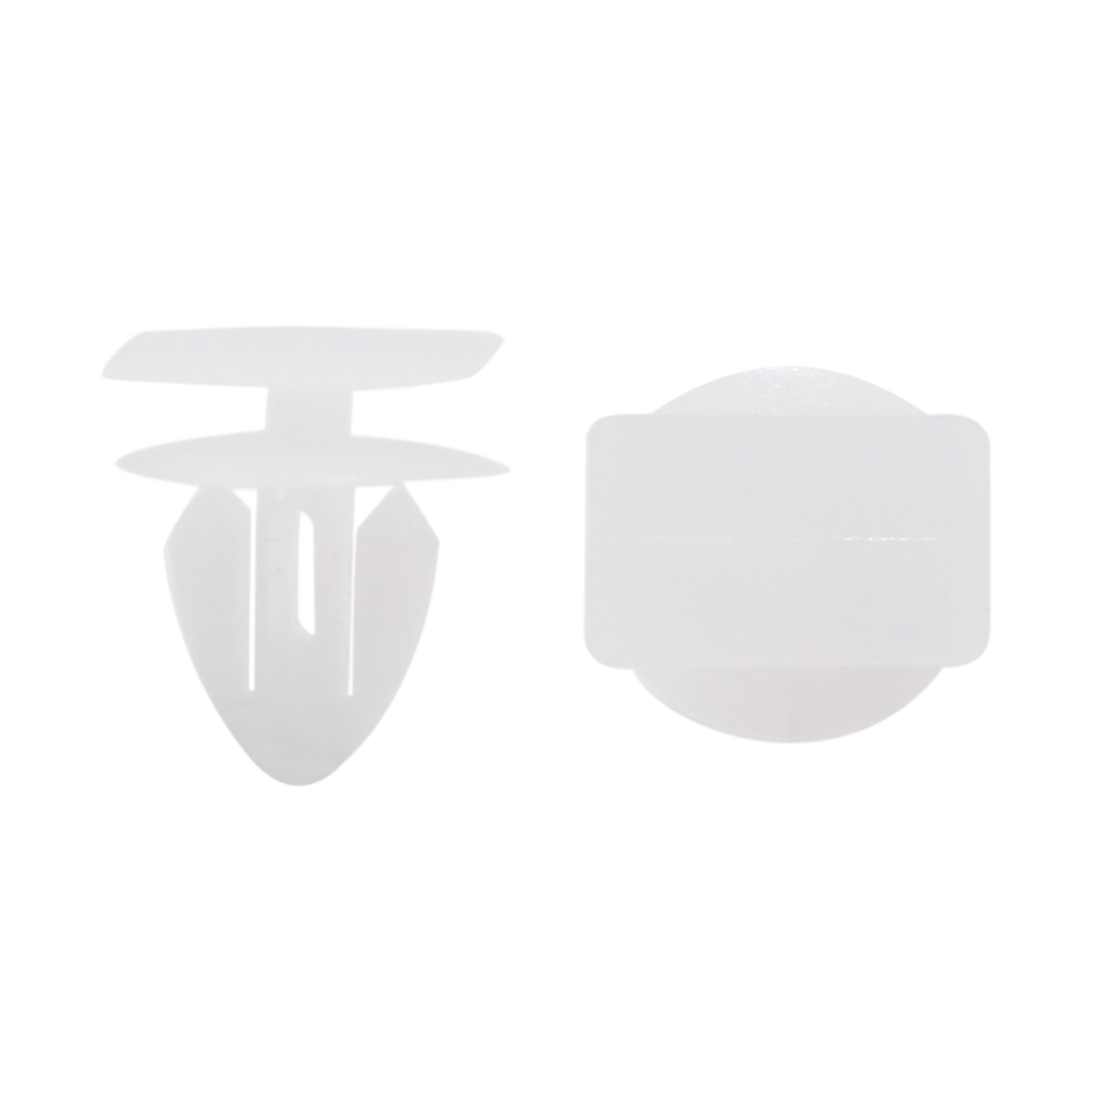 50pcs Plastic Rivets Fastener Car Auto Fender Fixing Clips White Fits 11mm Hole